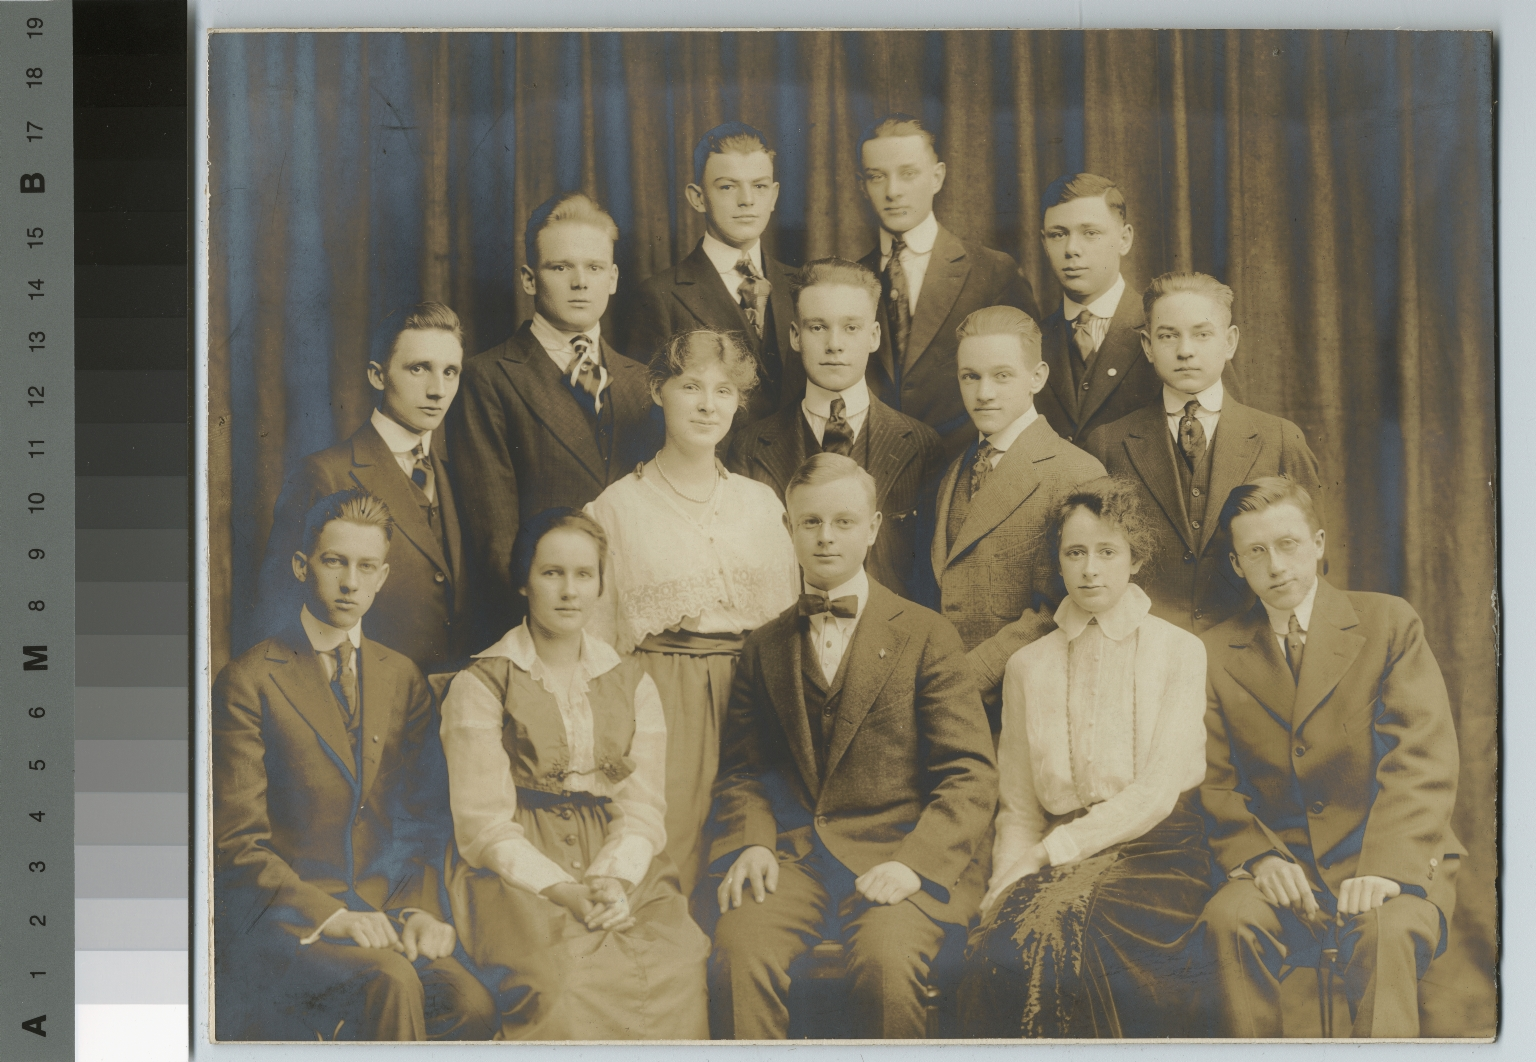 Academics, class photo, group portrait of Rochester Athenaeum and Mechanics Institute students, [1915-1920]